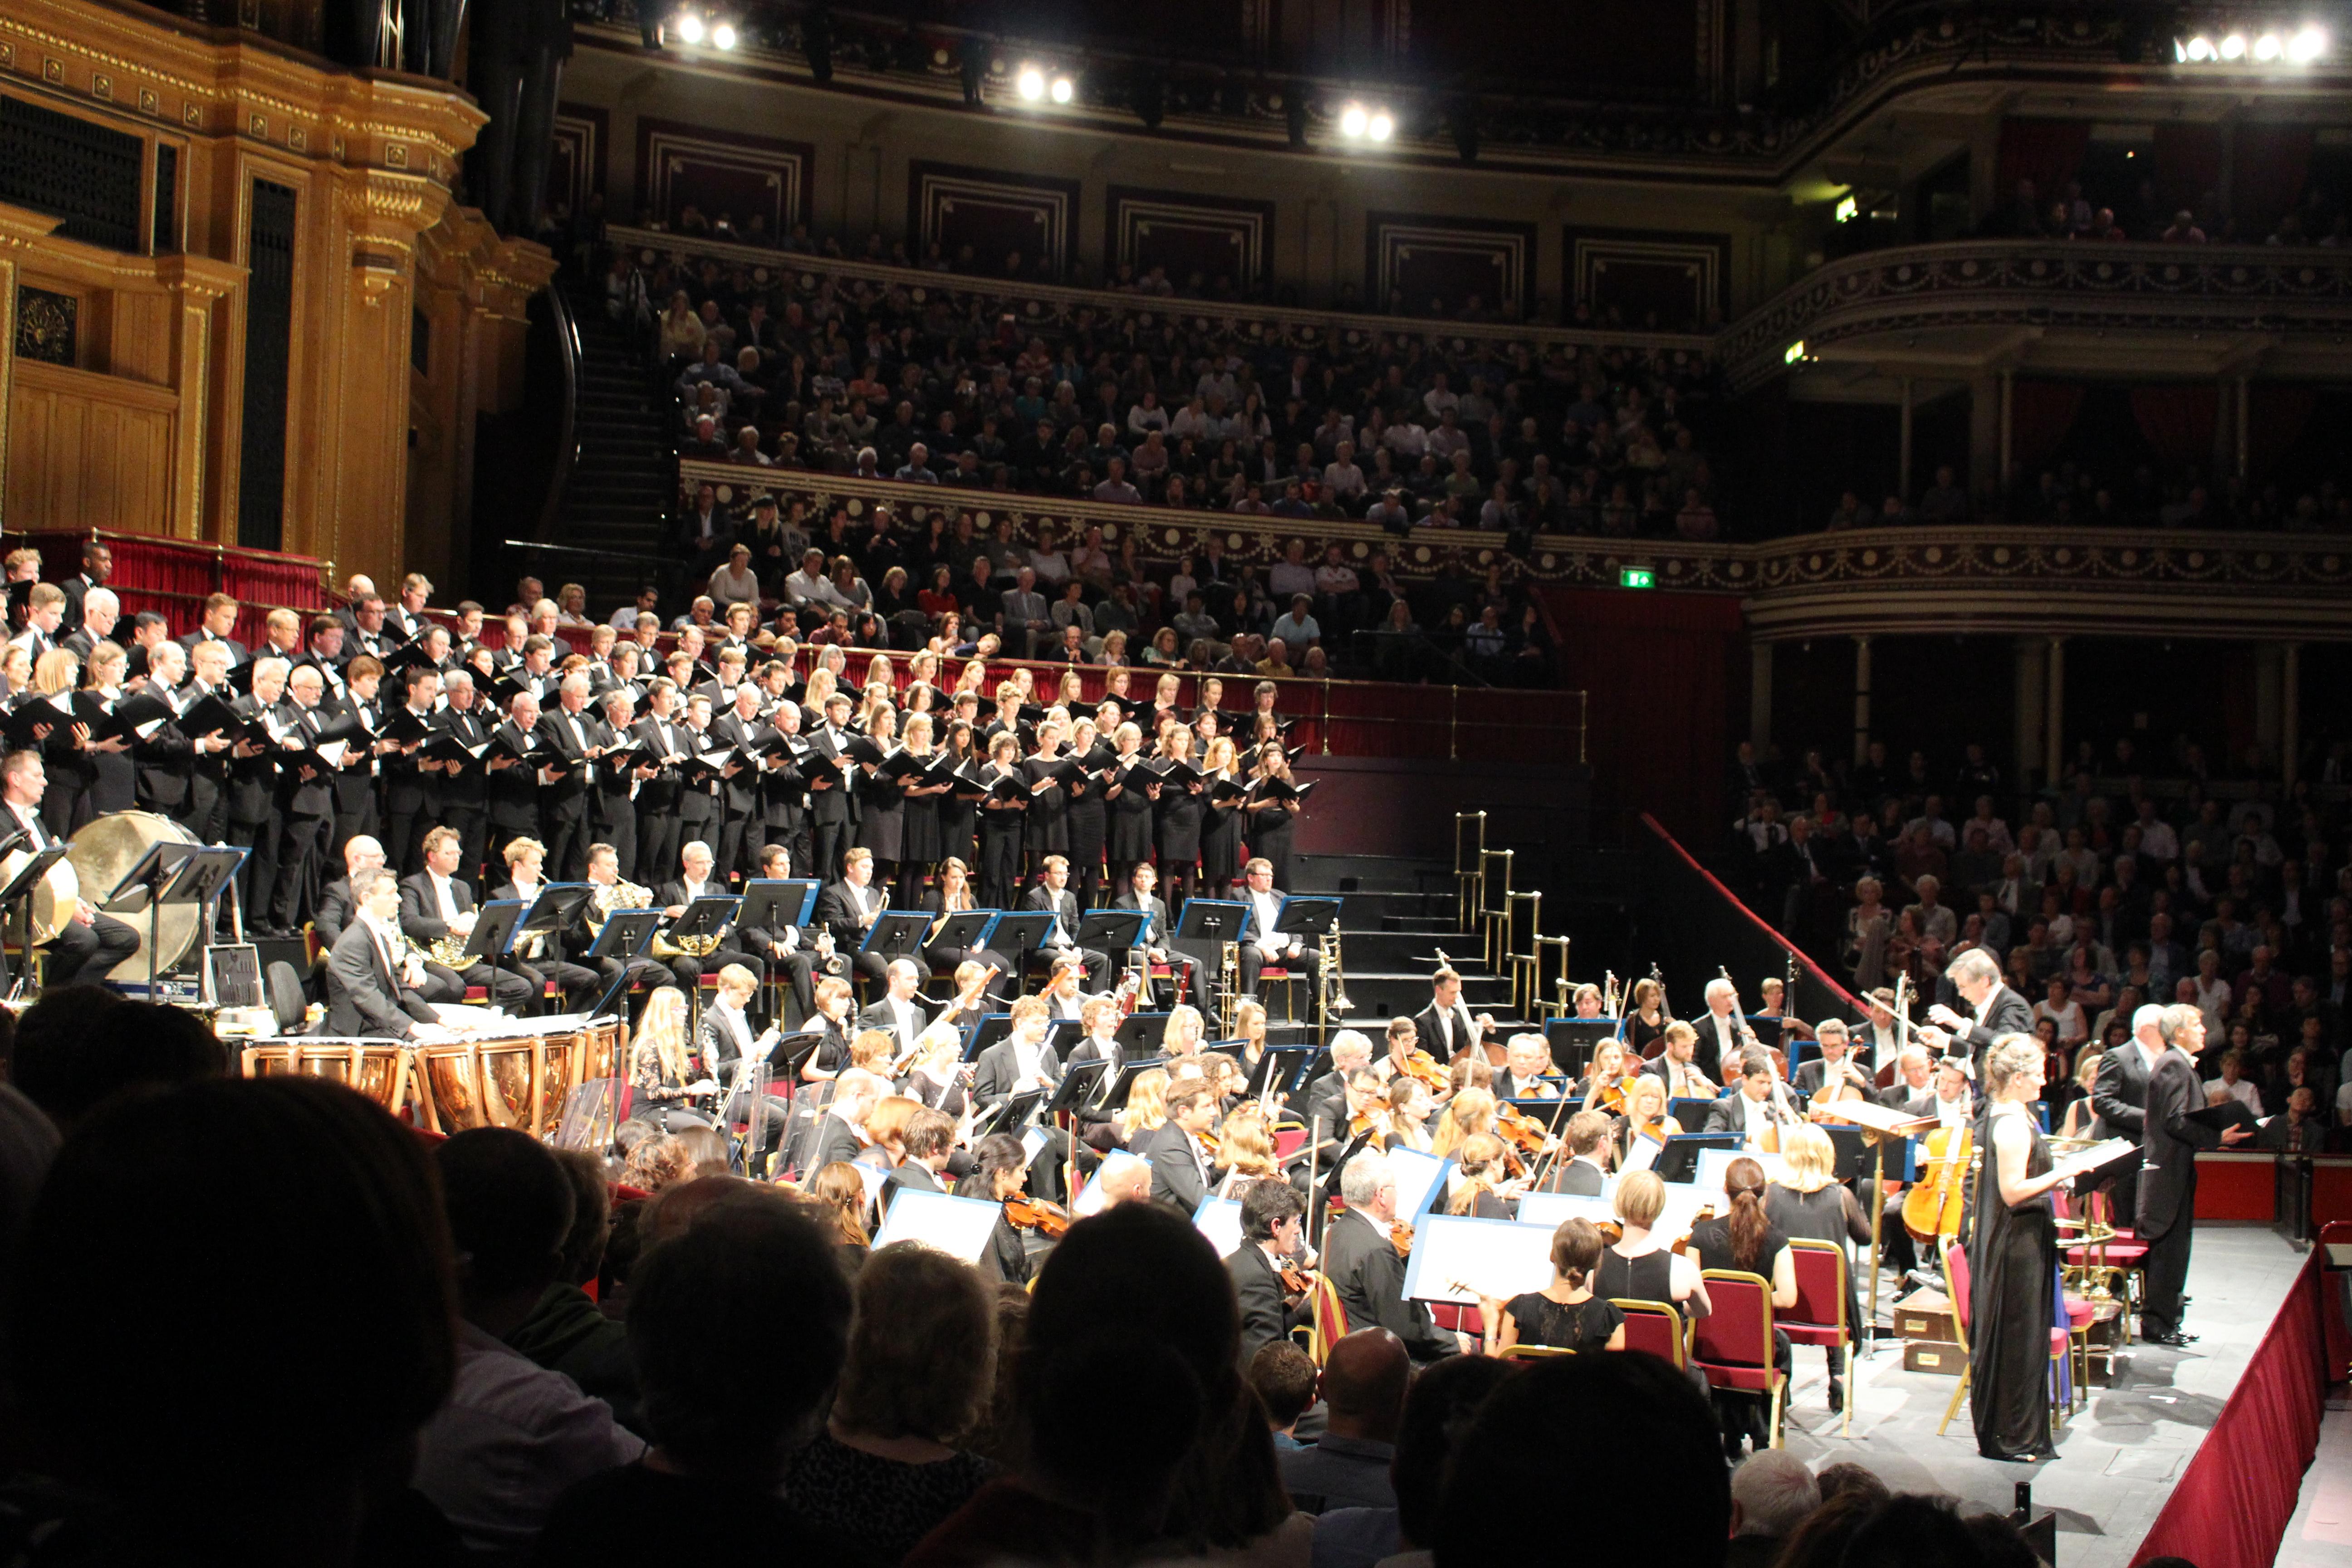 gladsaxe symphony orchestra Han er utrolig